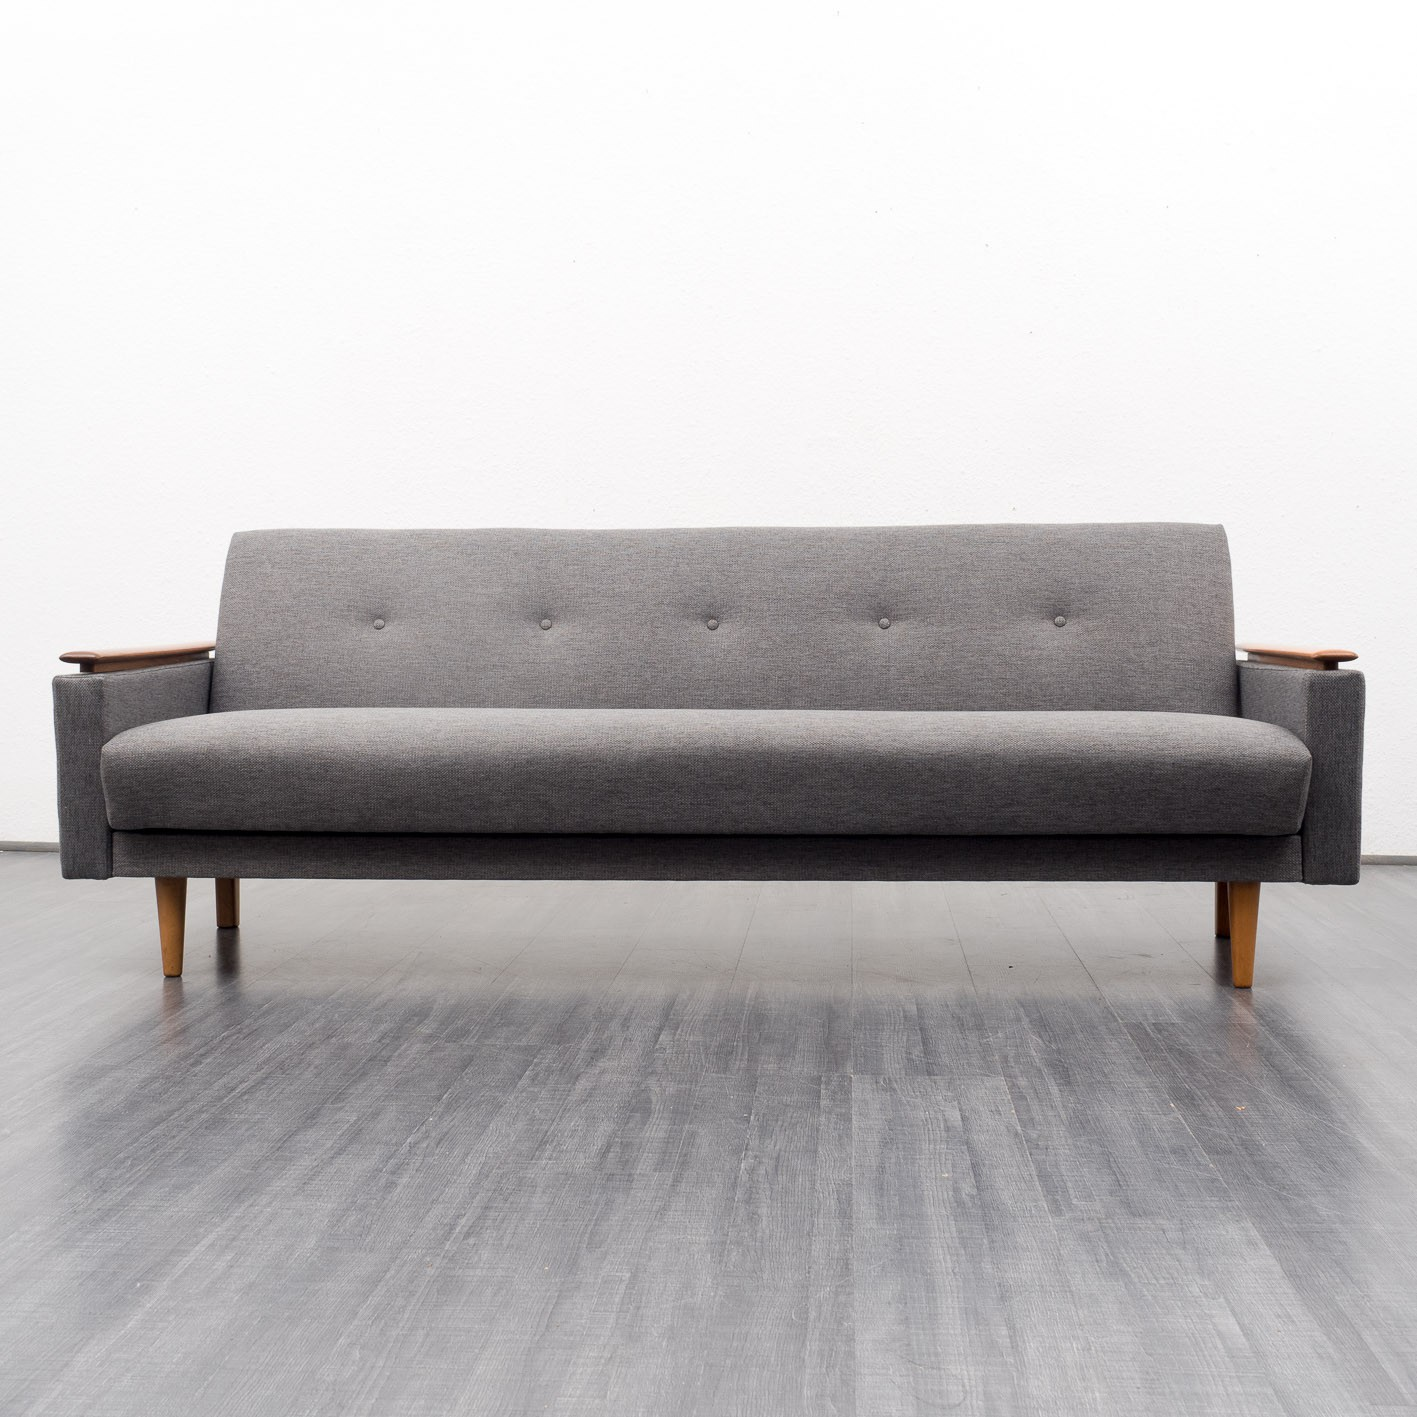 Mid Century Grey Sofa: Mid-century Grey Sofa With Folding Function